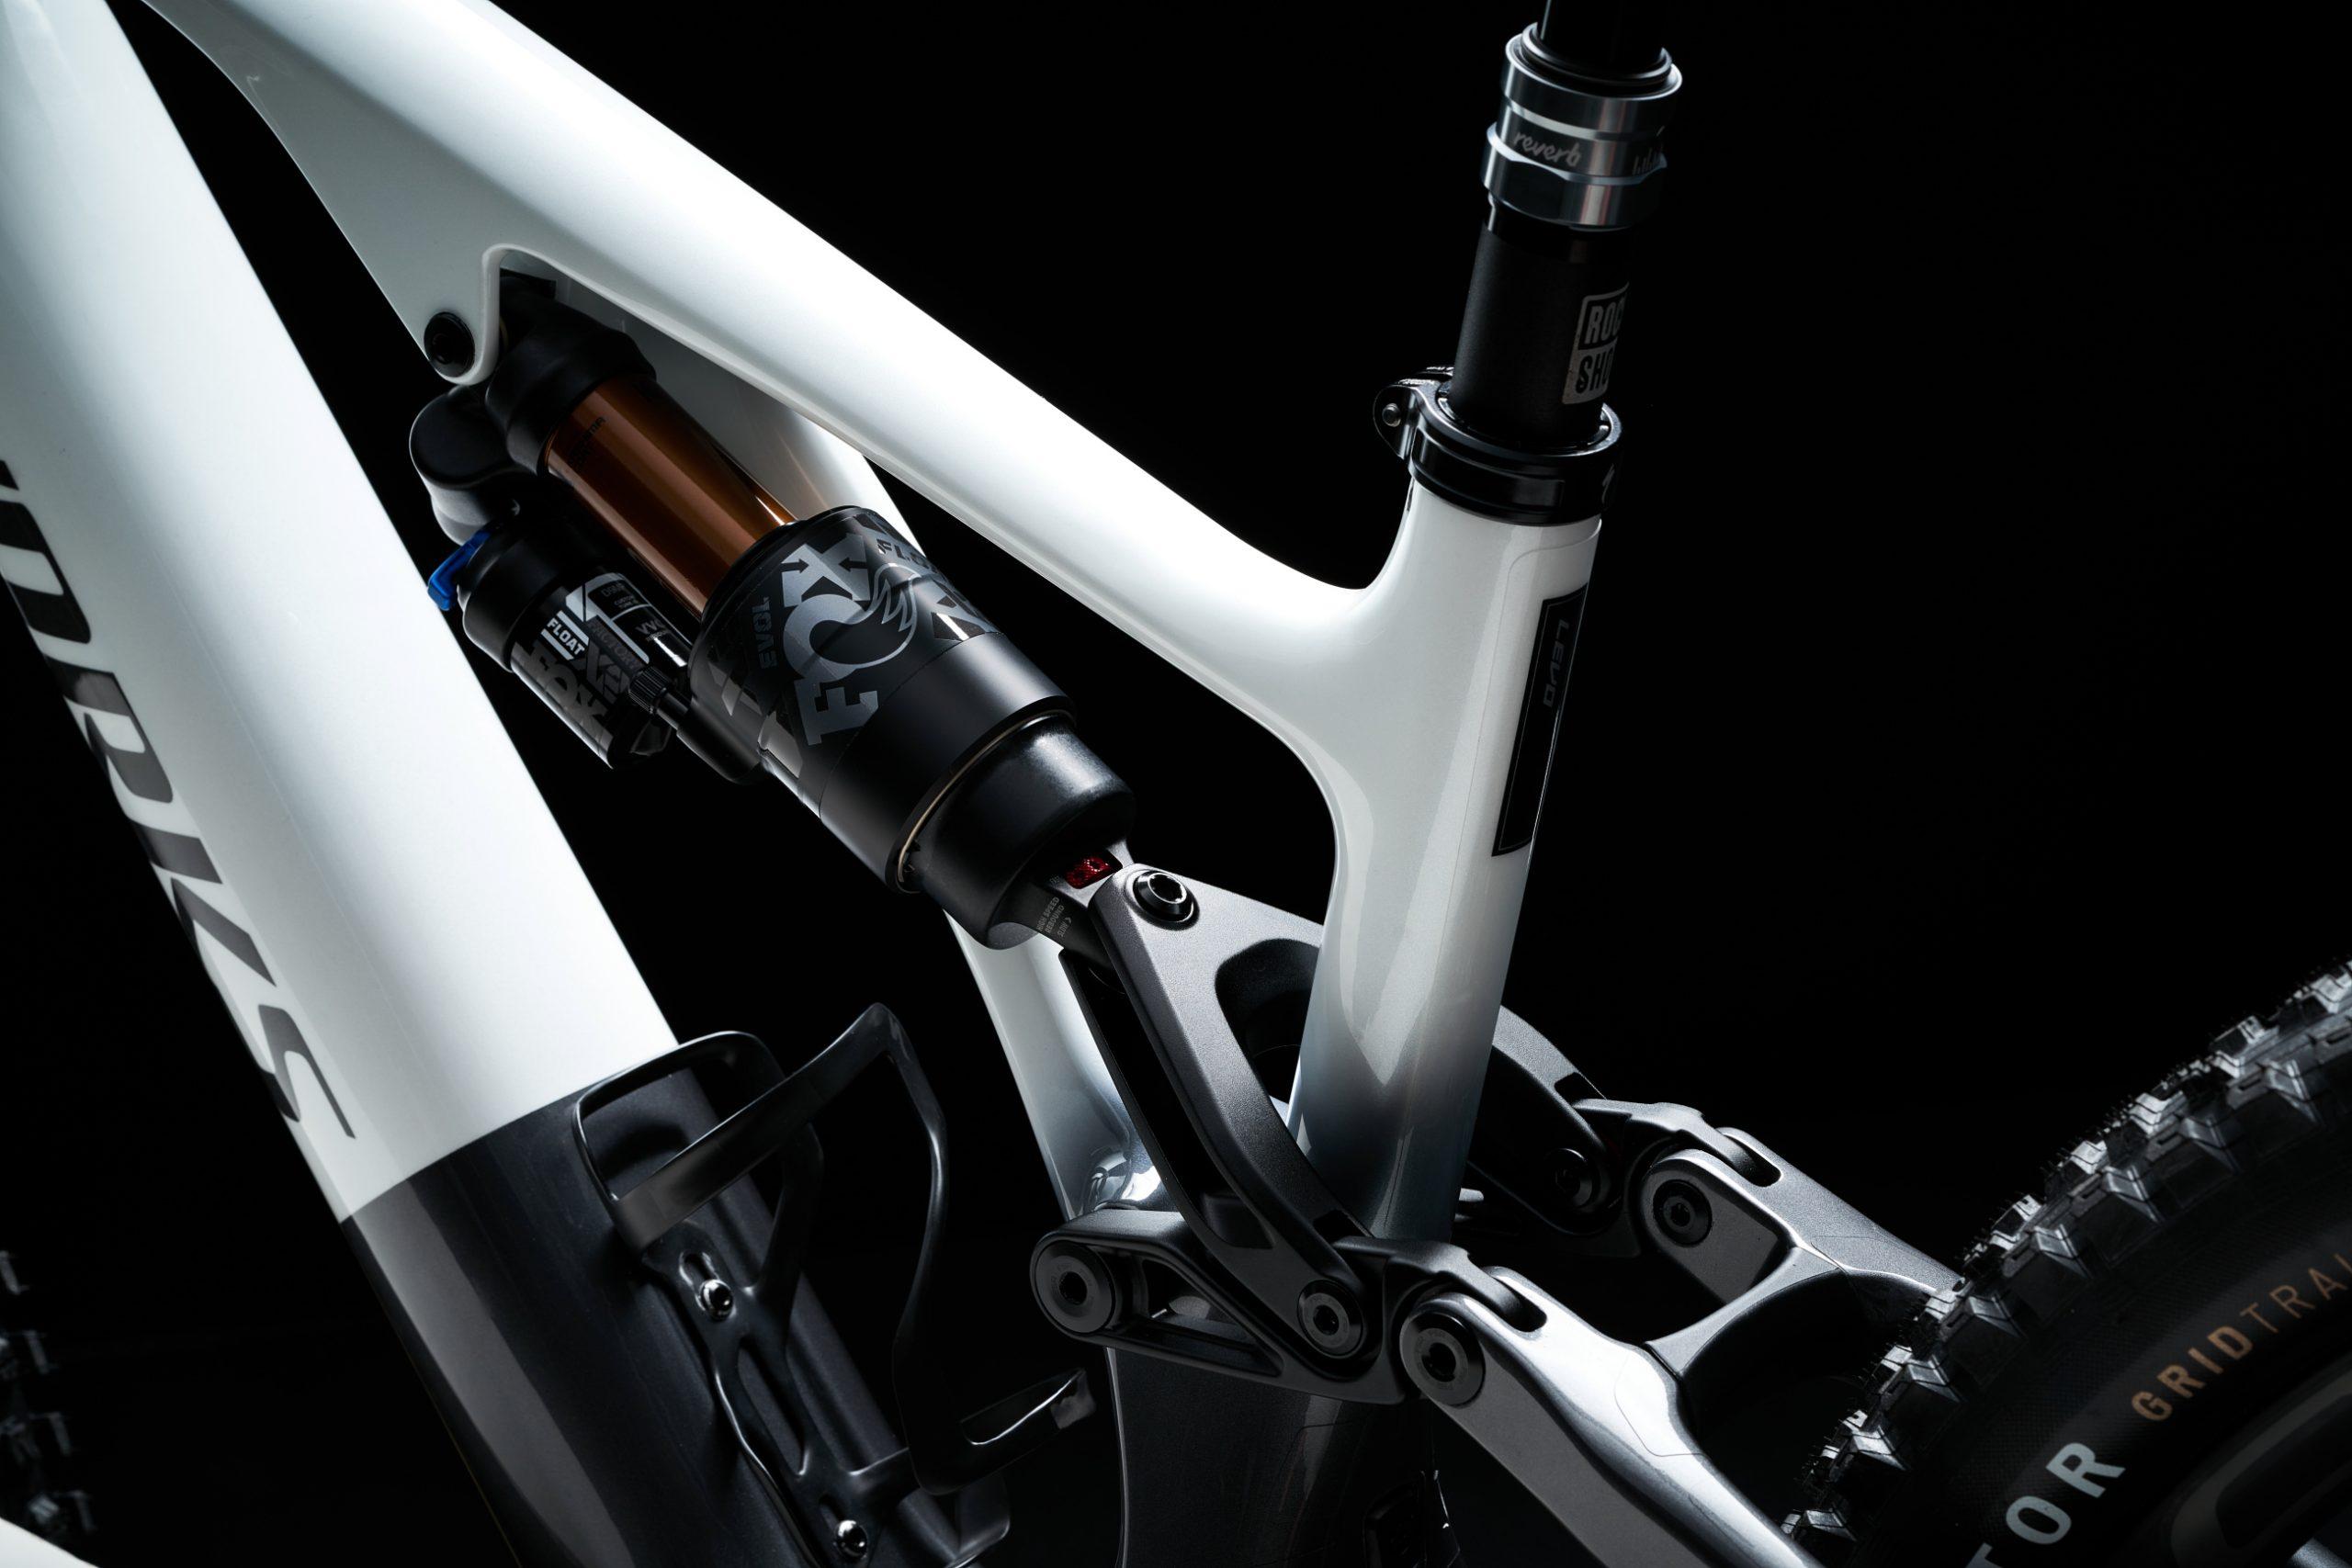 New Specialized Levo G3 2510 scaled Cycleholix